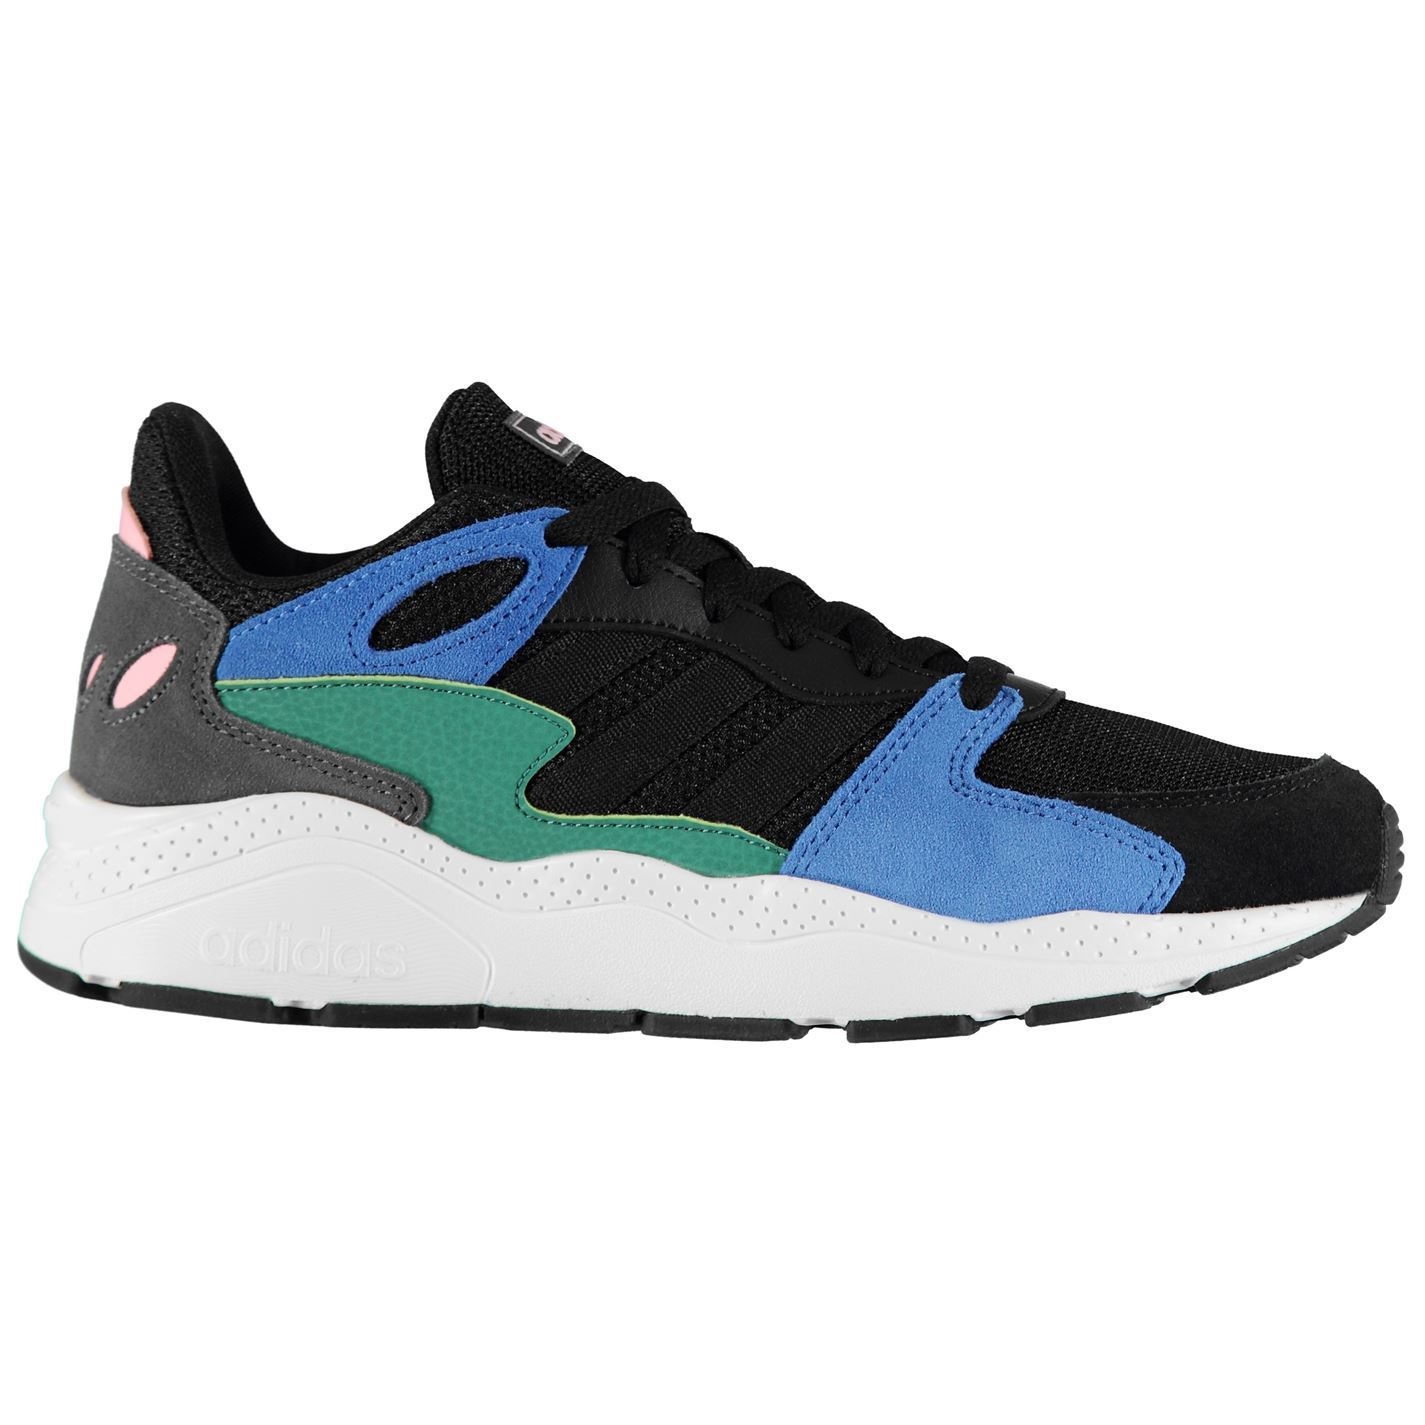 Adidas-Crazychaos-Baskets-Homme-Chaussures-De-Loisirs-Chaussures-Baskets miniature 12